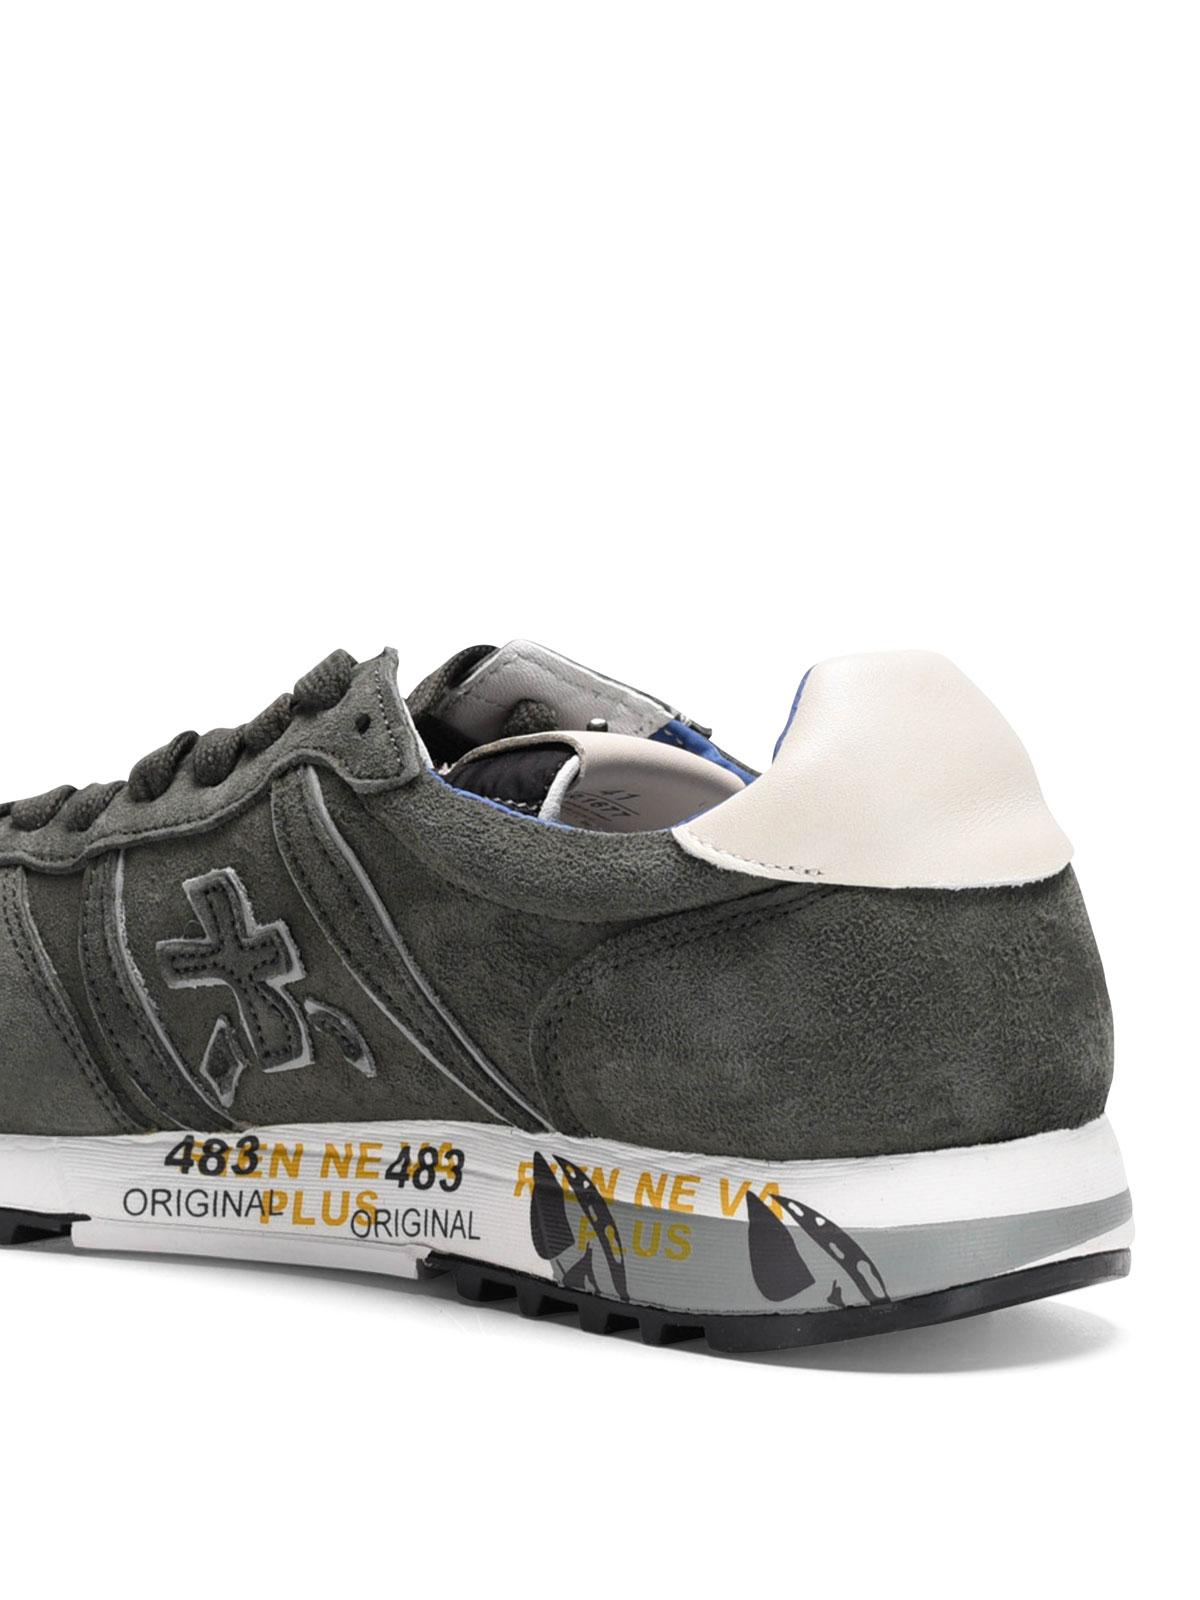 Premiata Sneaker Eric Shop Online 1677Ikrix Grün X8O0kPNnw